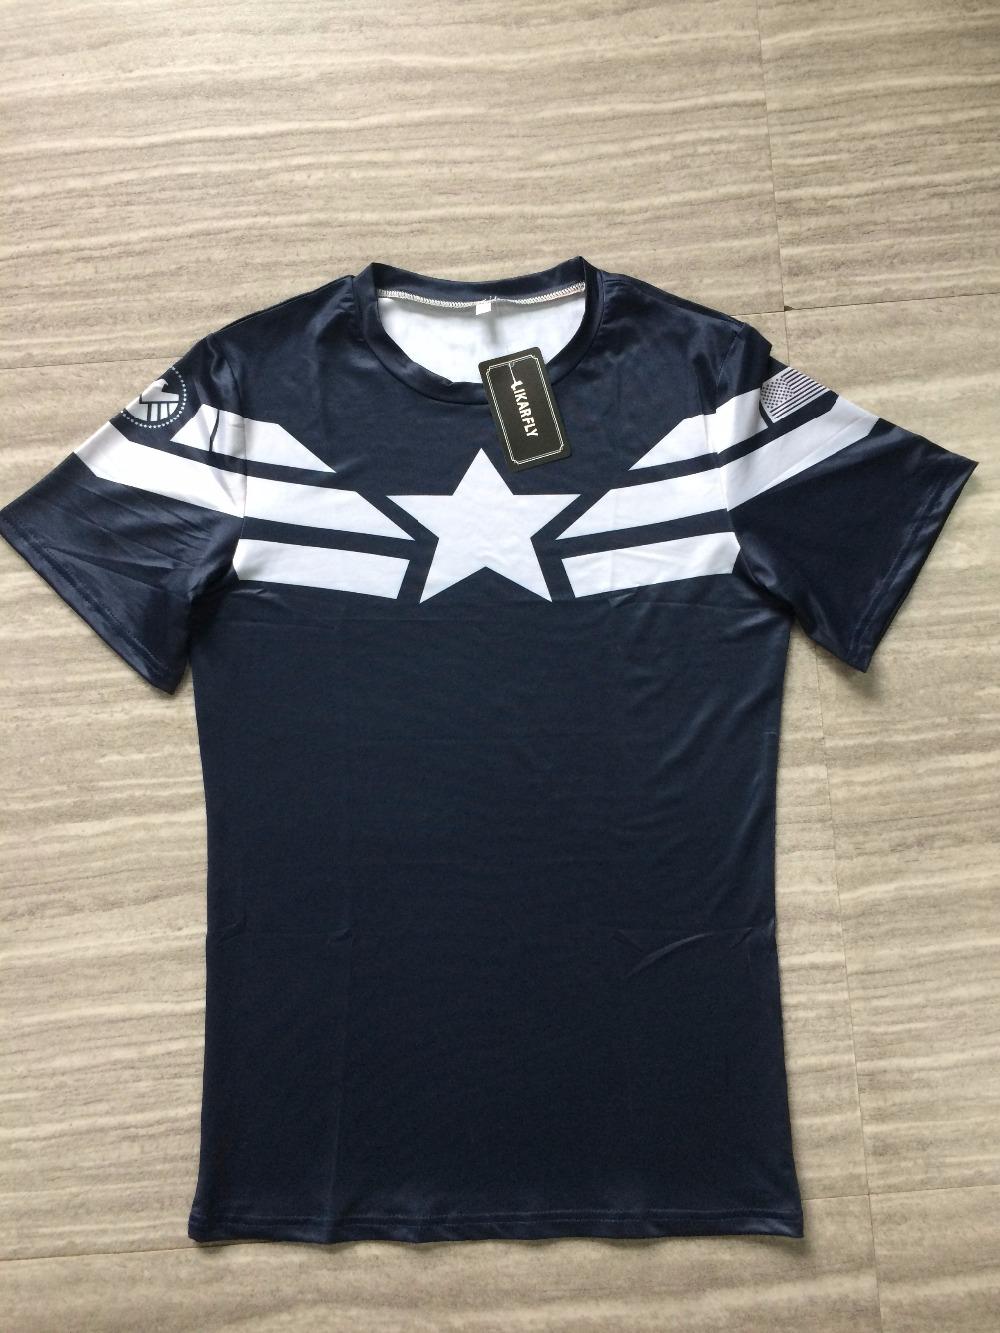 superhero t shirts